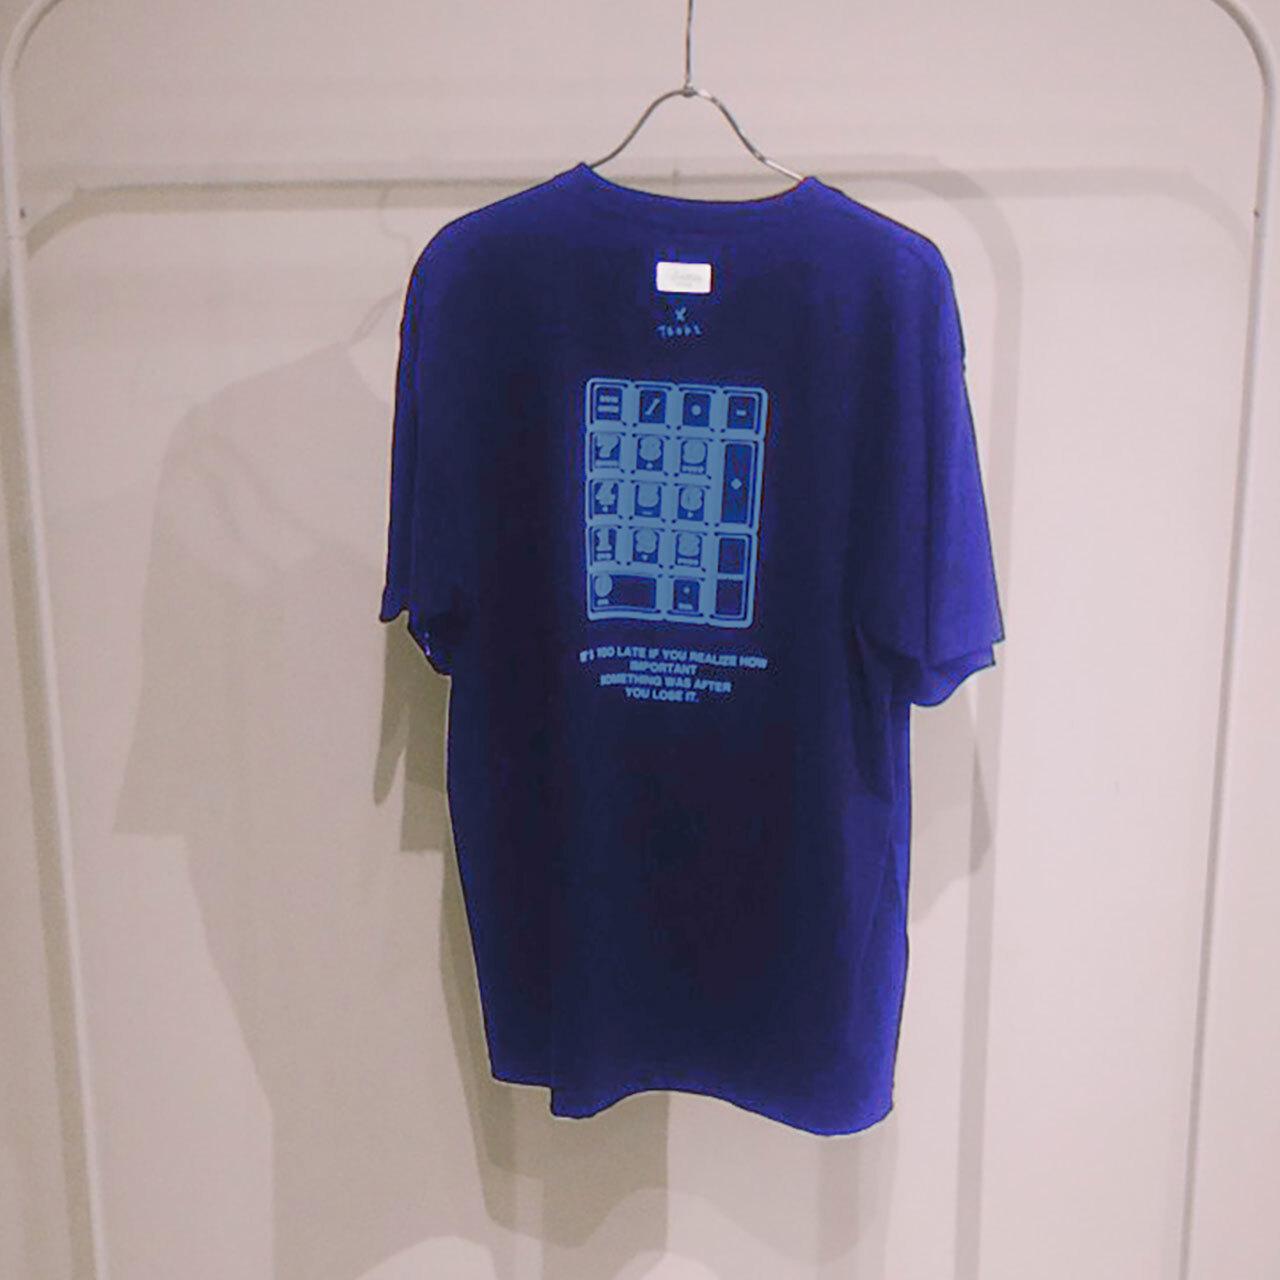 TENKI × A Man Collaboration Tee Purple × Light blue